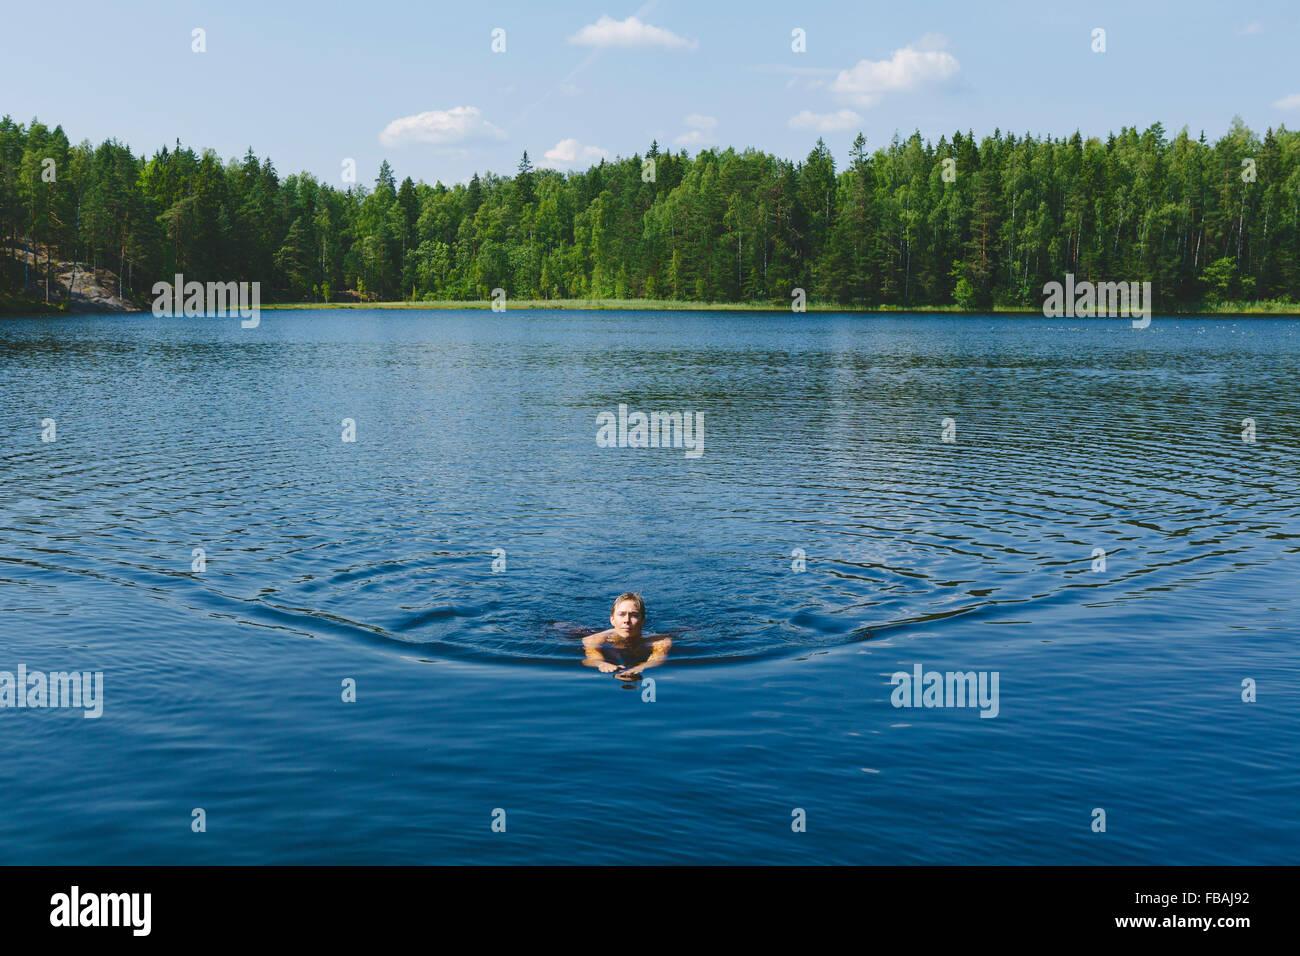 La Finlande, l'Uusimaa, Finlande, Lac, jeune homme Kvarntrask la natation dans le lac Photo Stock